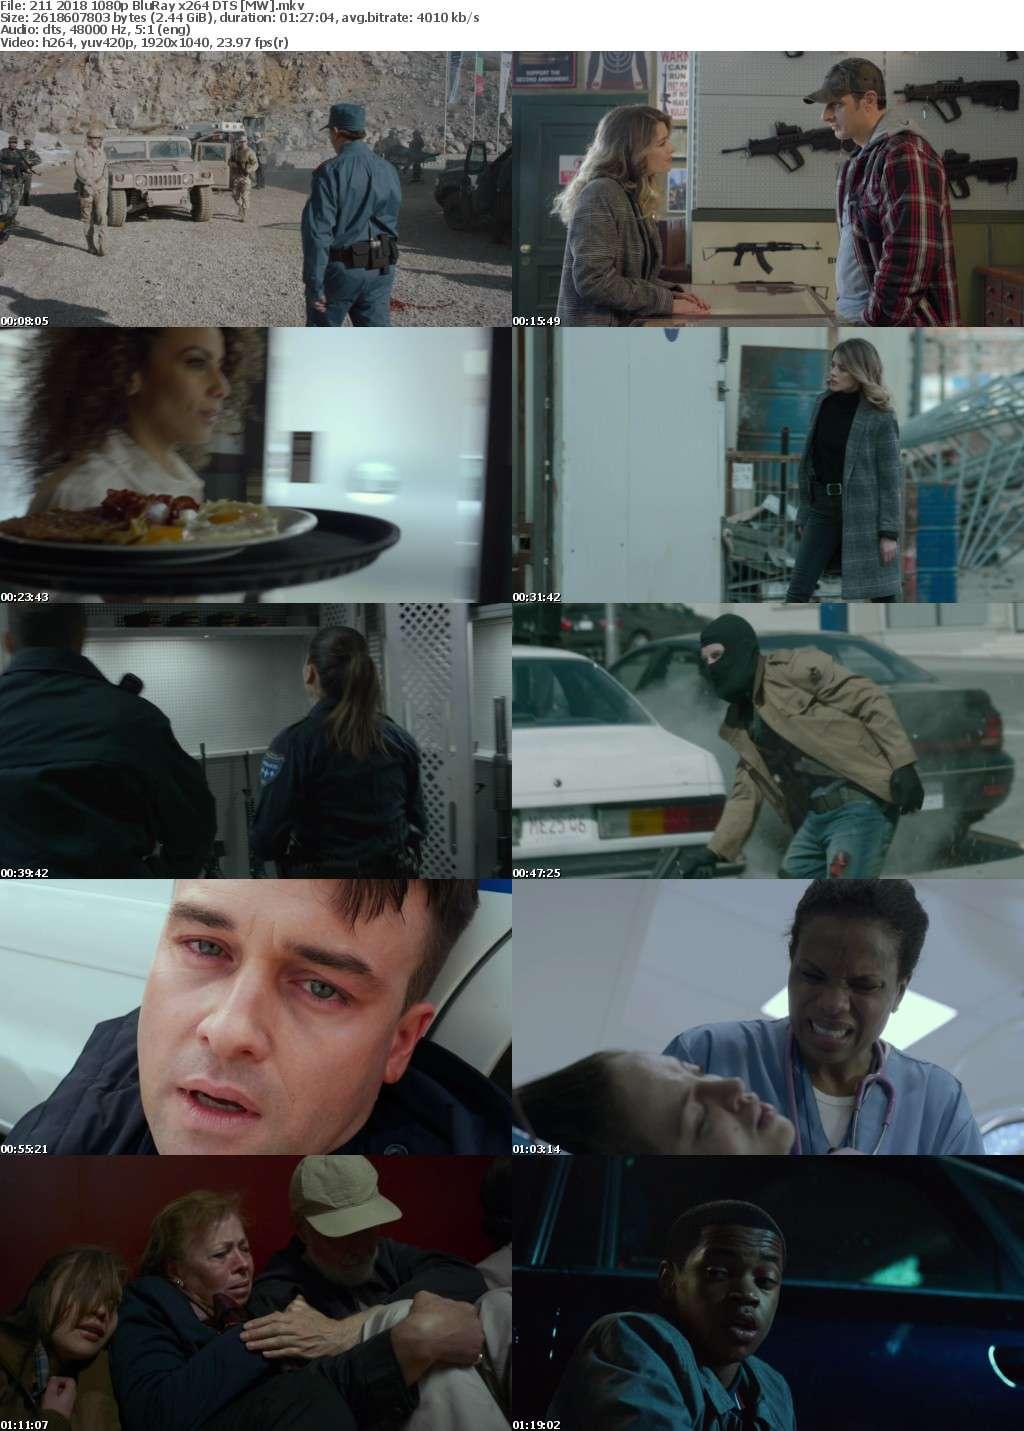 211 2018 1080p BluRay x264 DTS MW